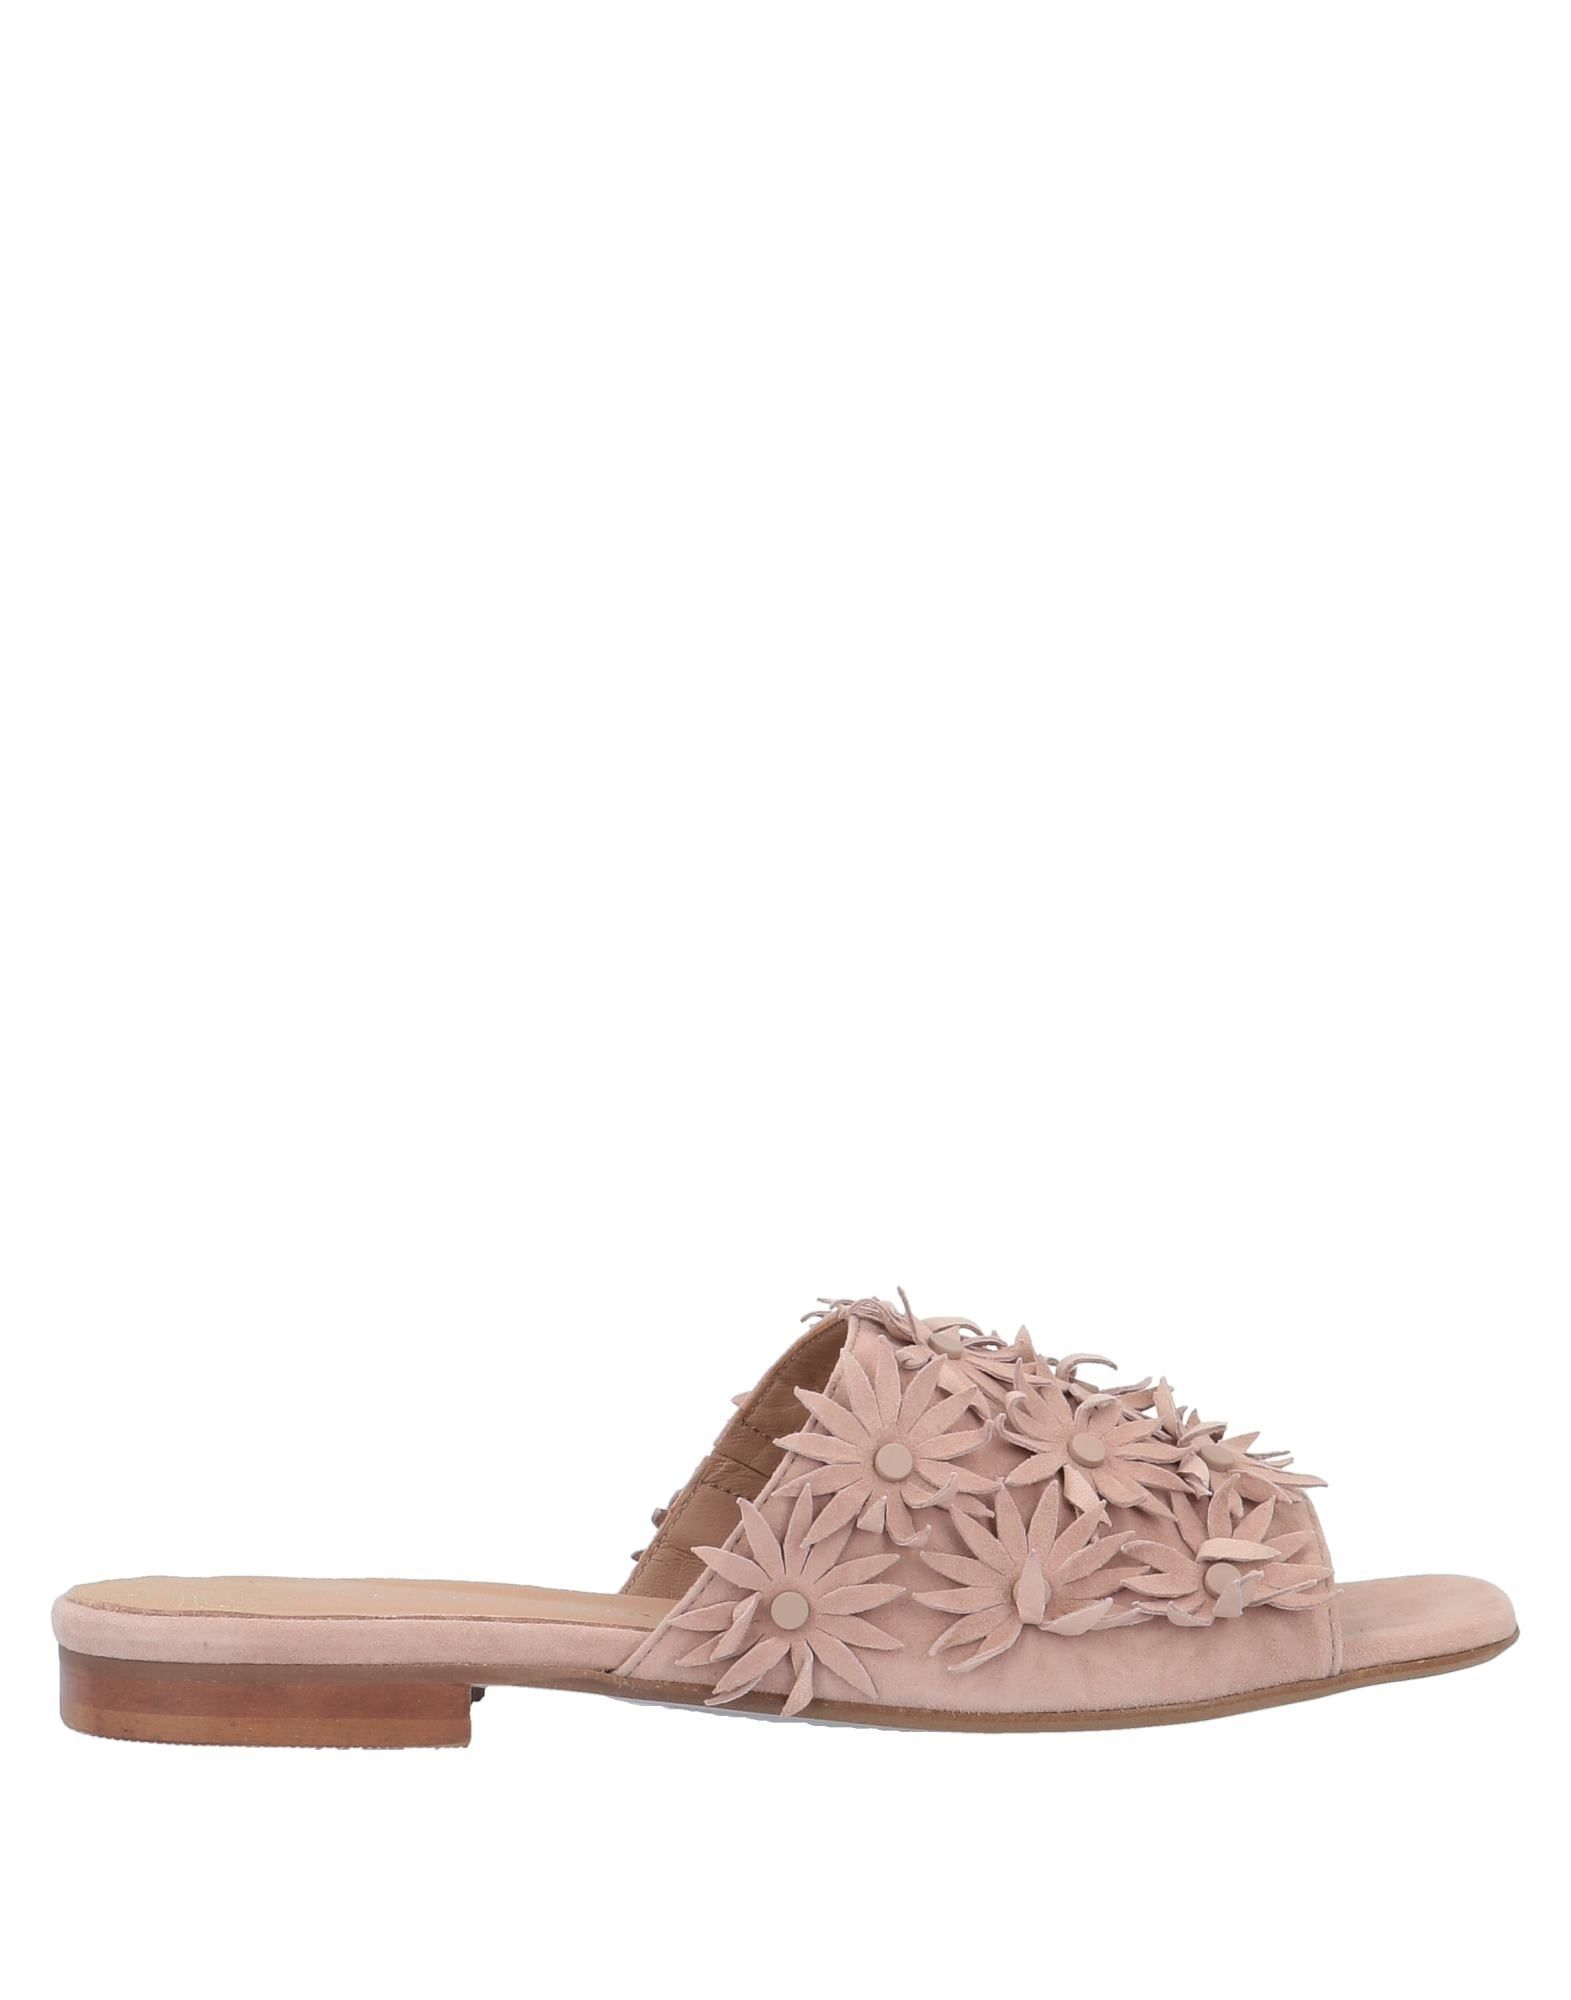 Фото - PEDRO MIRALLES Сандалии pedro miralles обувь на шнурках